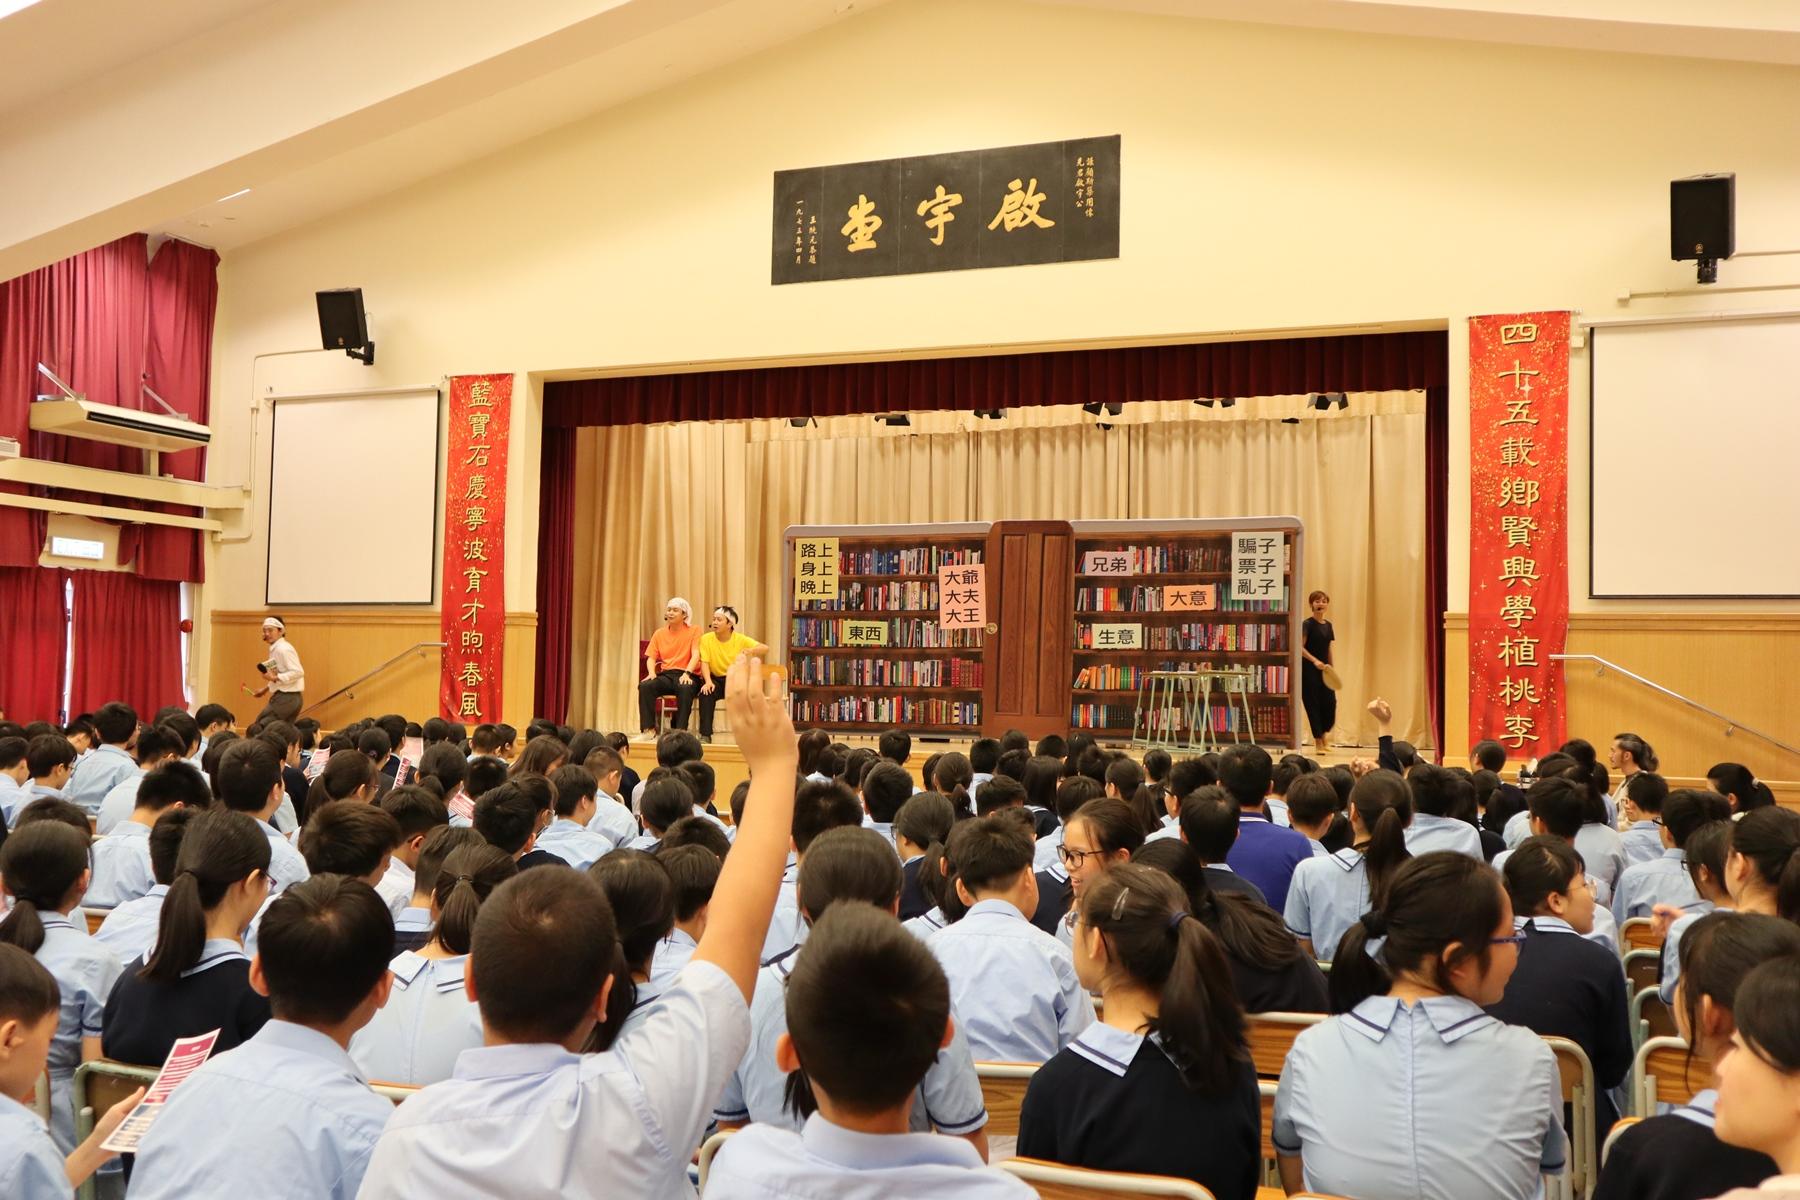 http://npc.edu.hk/sites/default/files/img_0060.jpg